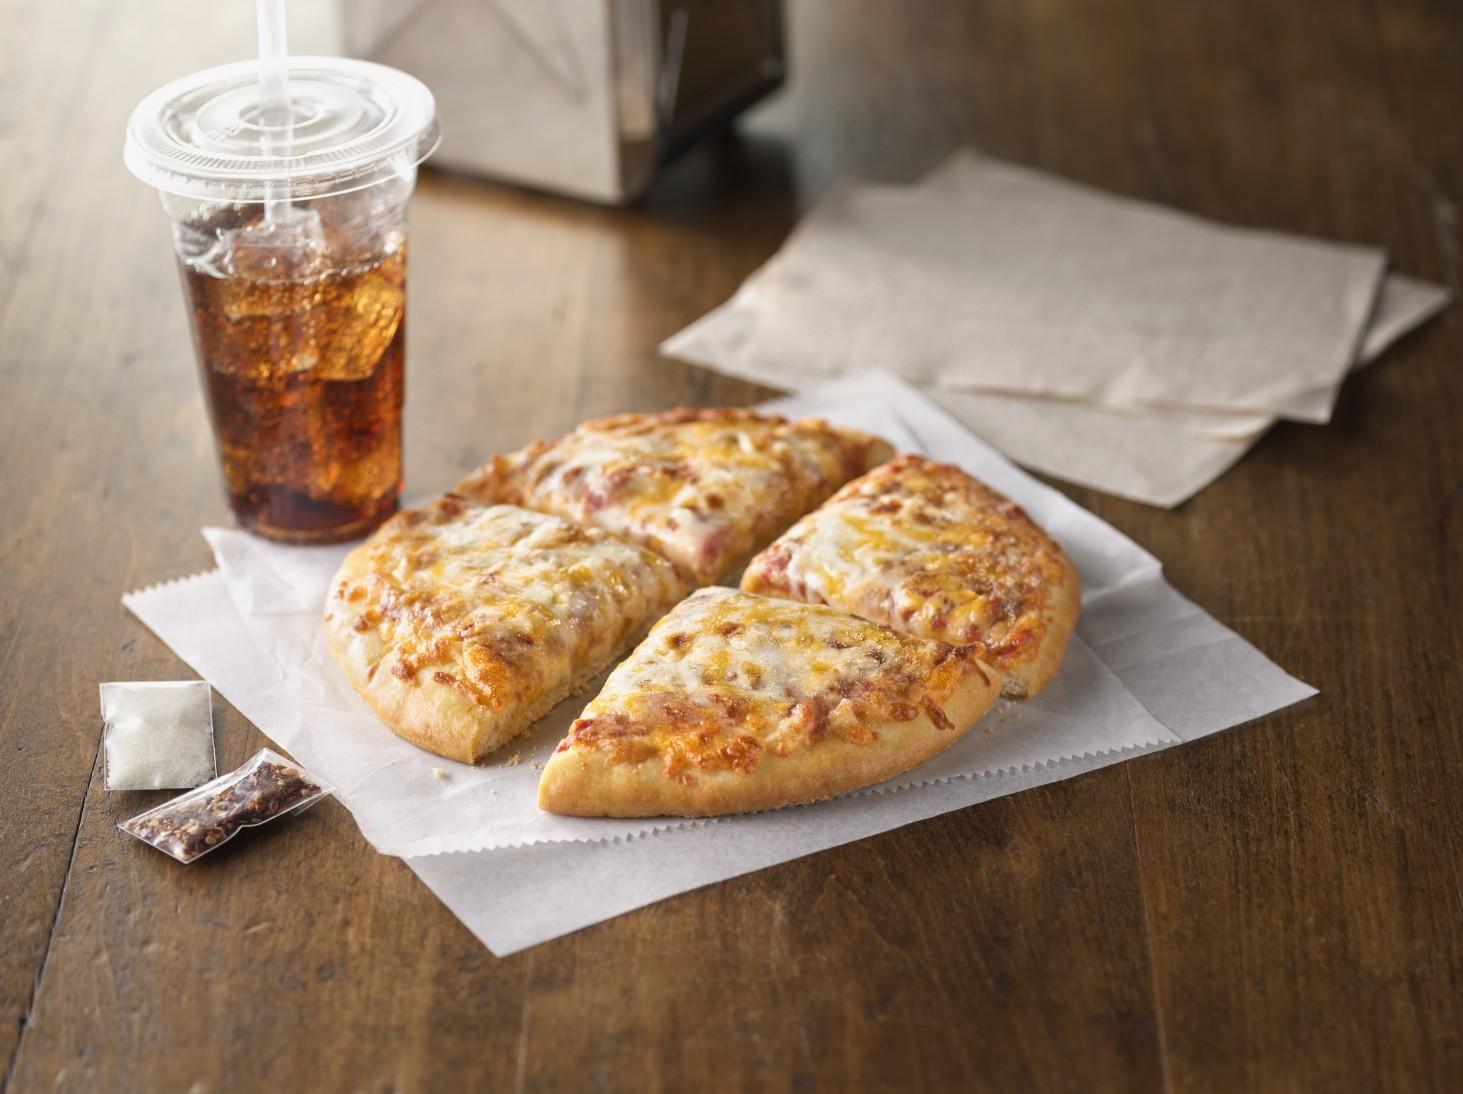 villa_prima_oven_ready_7_par_baked_four_cheese_pizza-68609